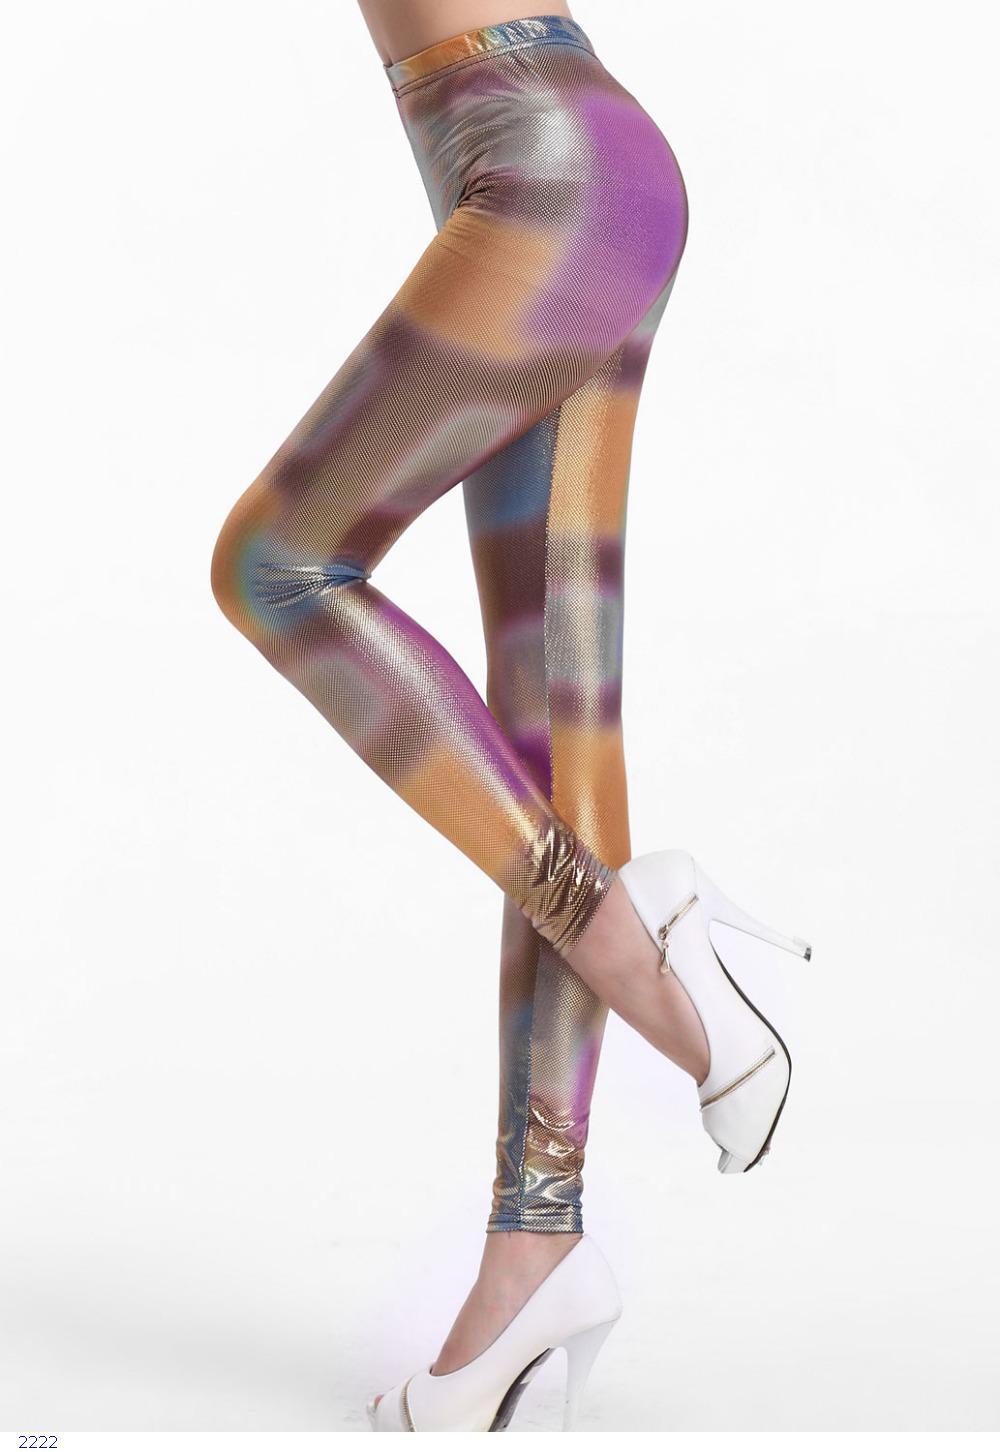 2014 women pants ,Shiny Neon Irregular Tie Dye Leggings Fitness LC79347 legging adventure time Drop Shipping - OY fashion Co., Ltd store